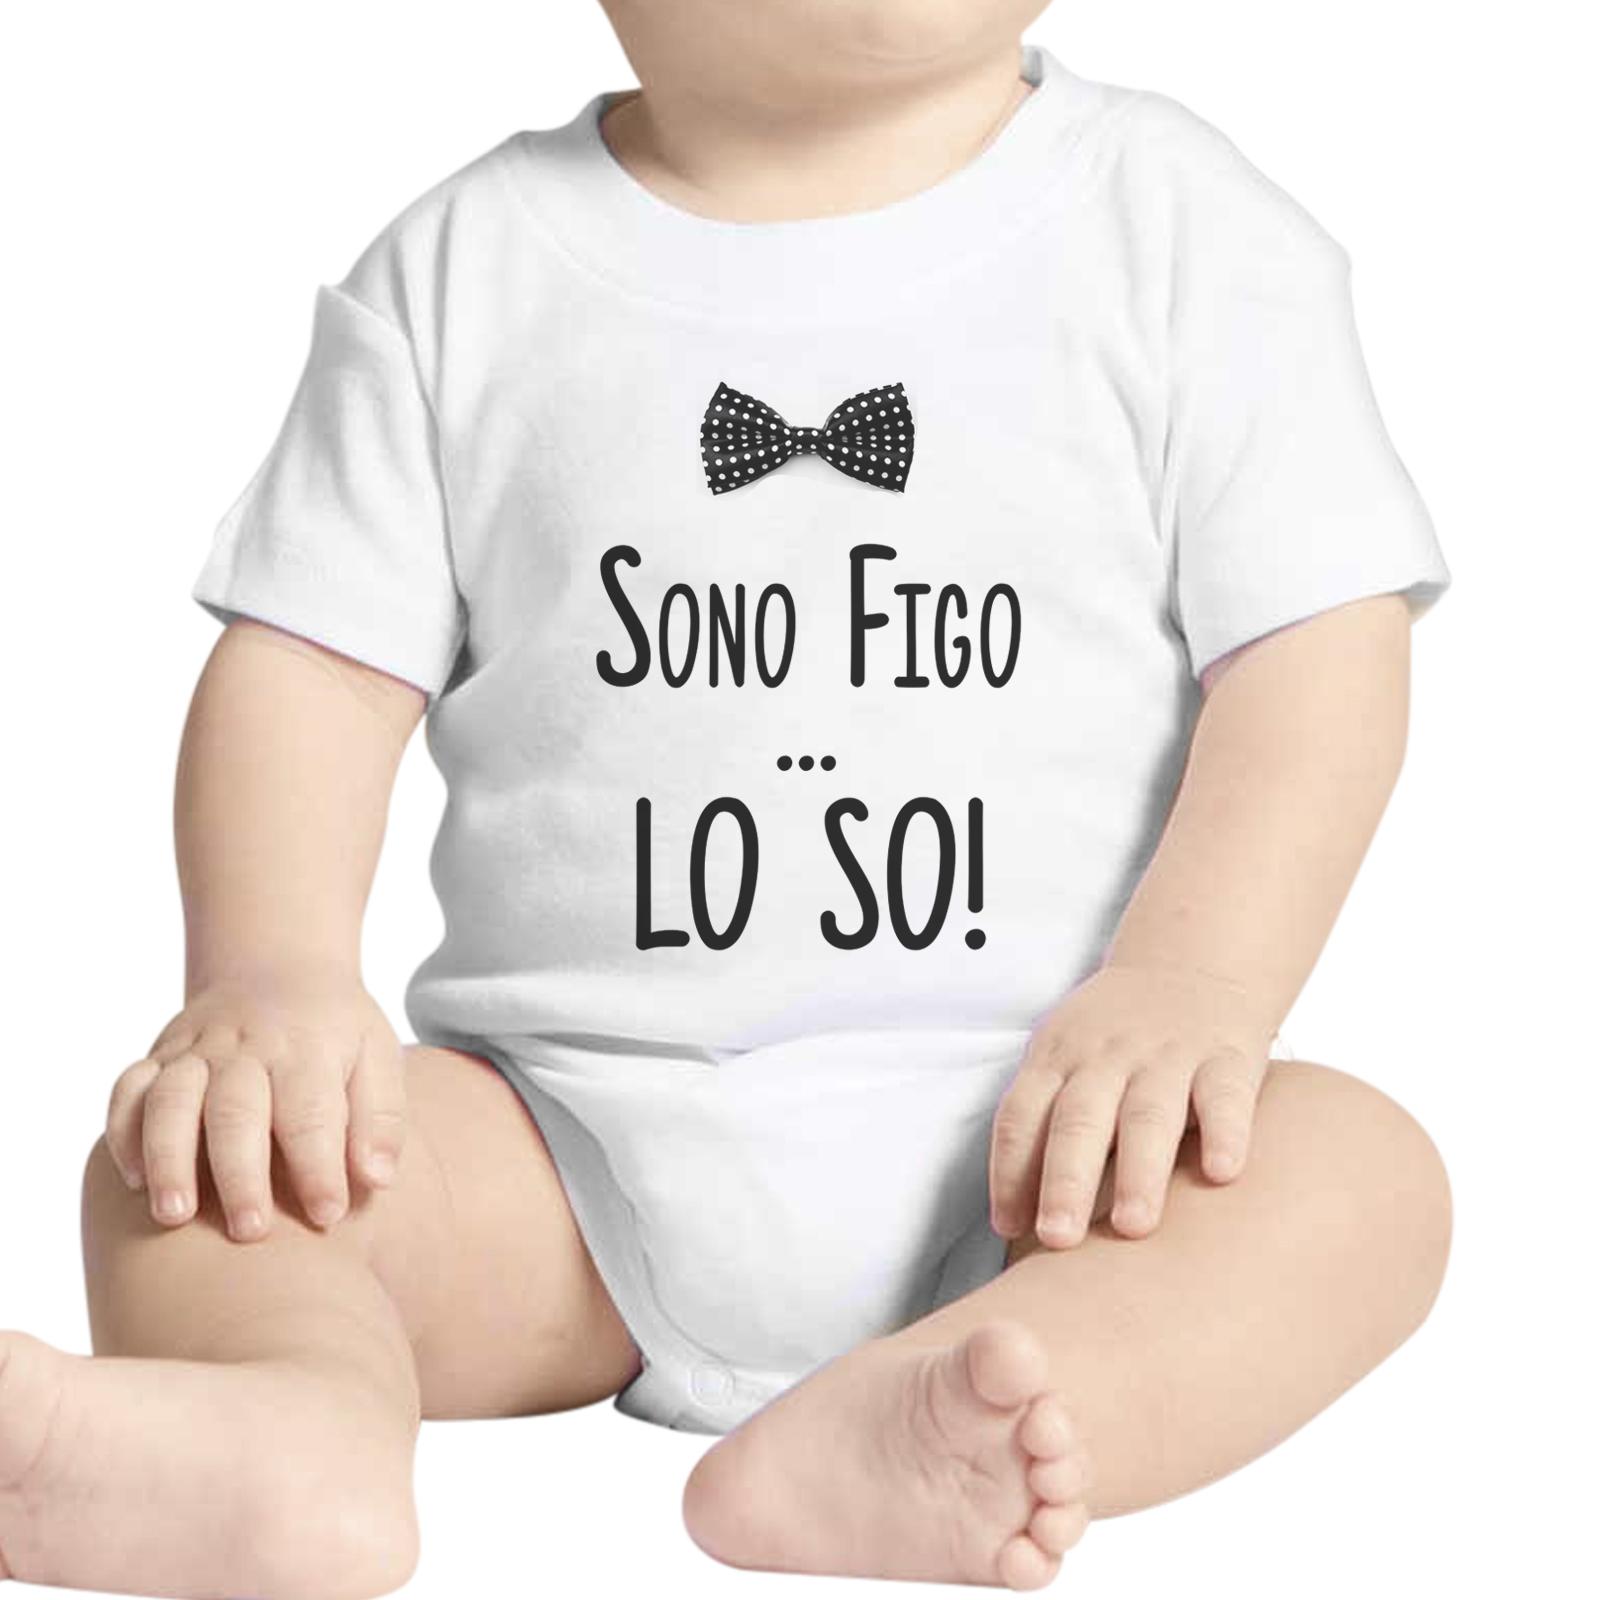 BODY SONO FIGO